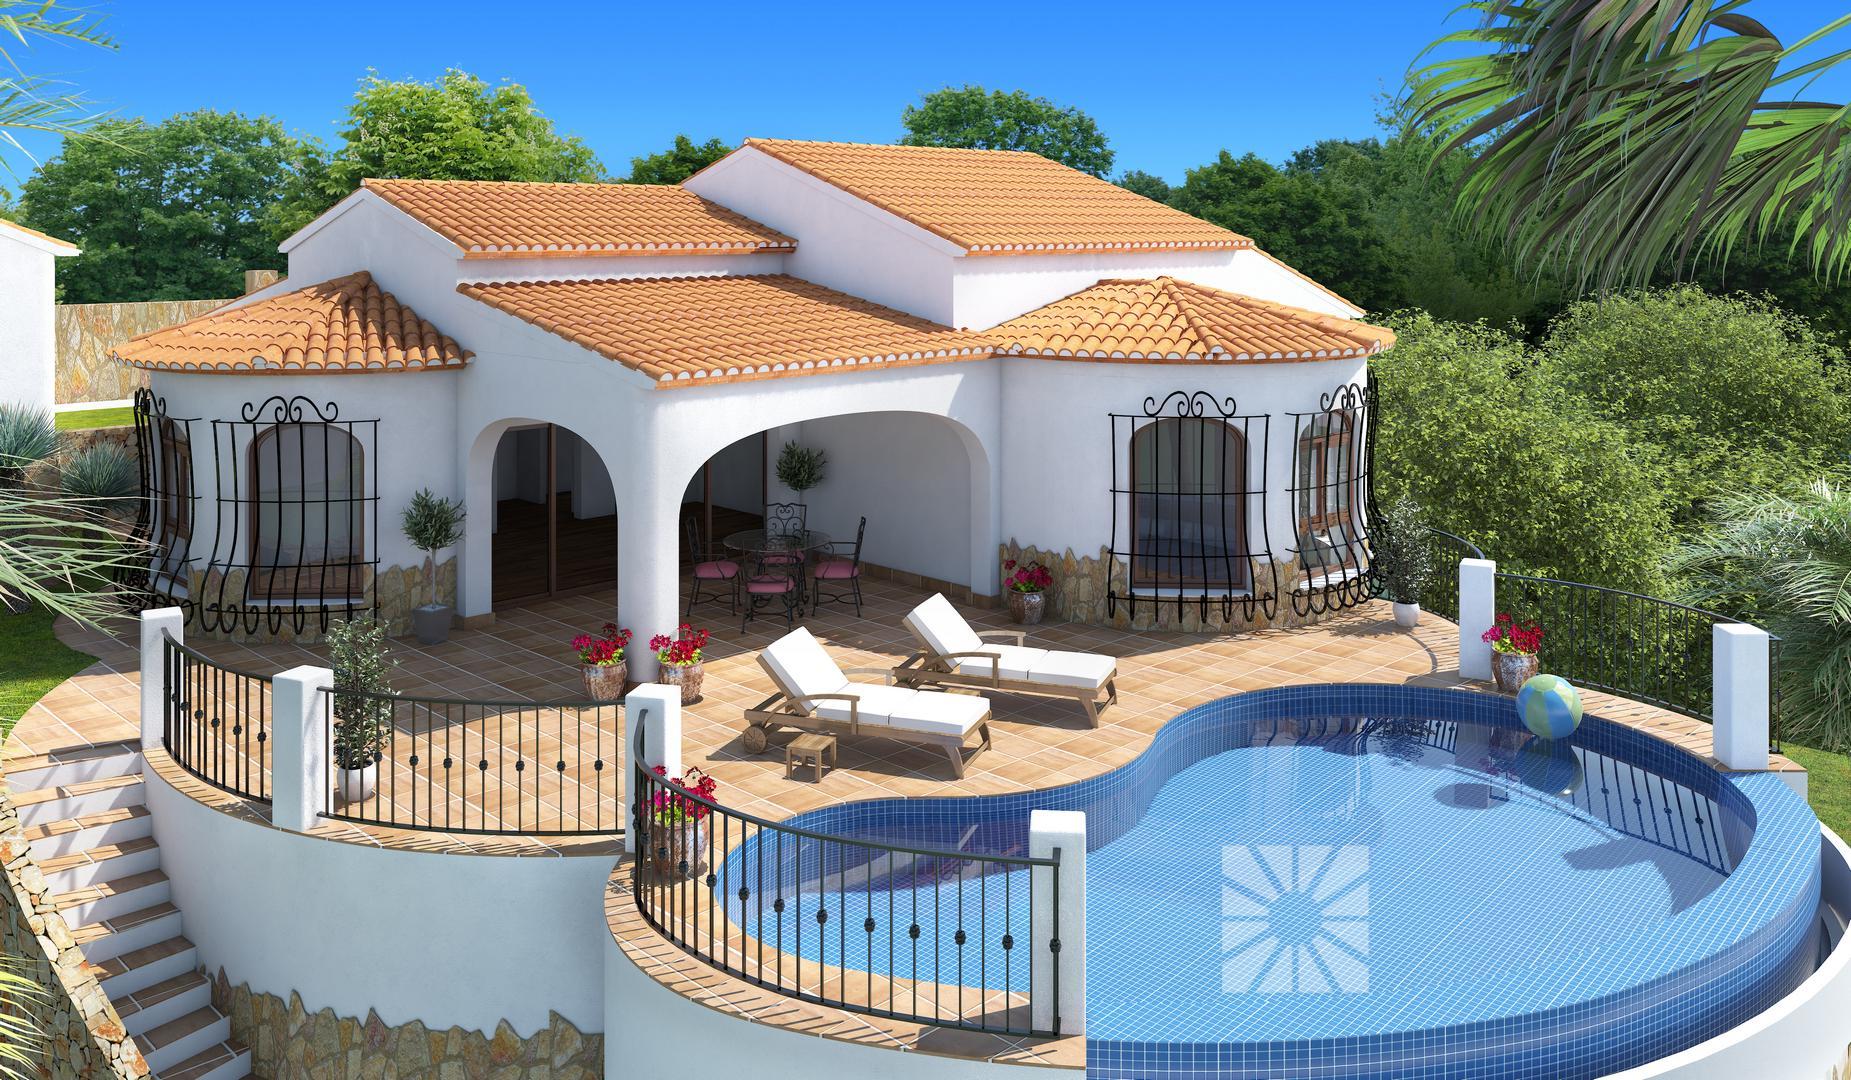 Venta chalets en cumbre del sol villa modelo oslo de 163 80 m2 - Modelos de chalet ...